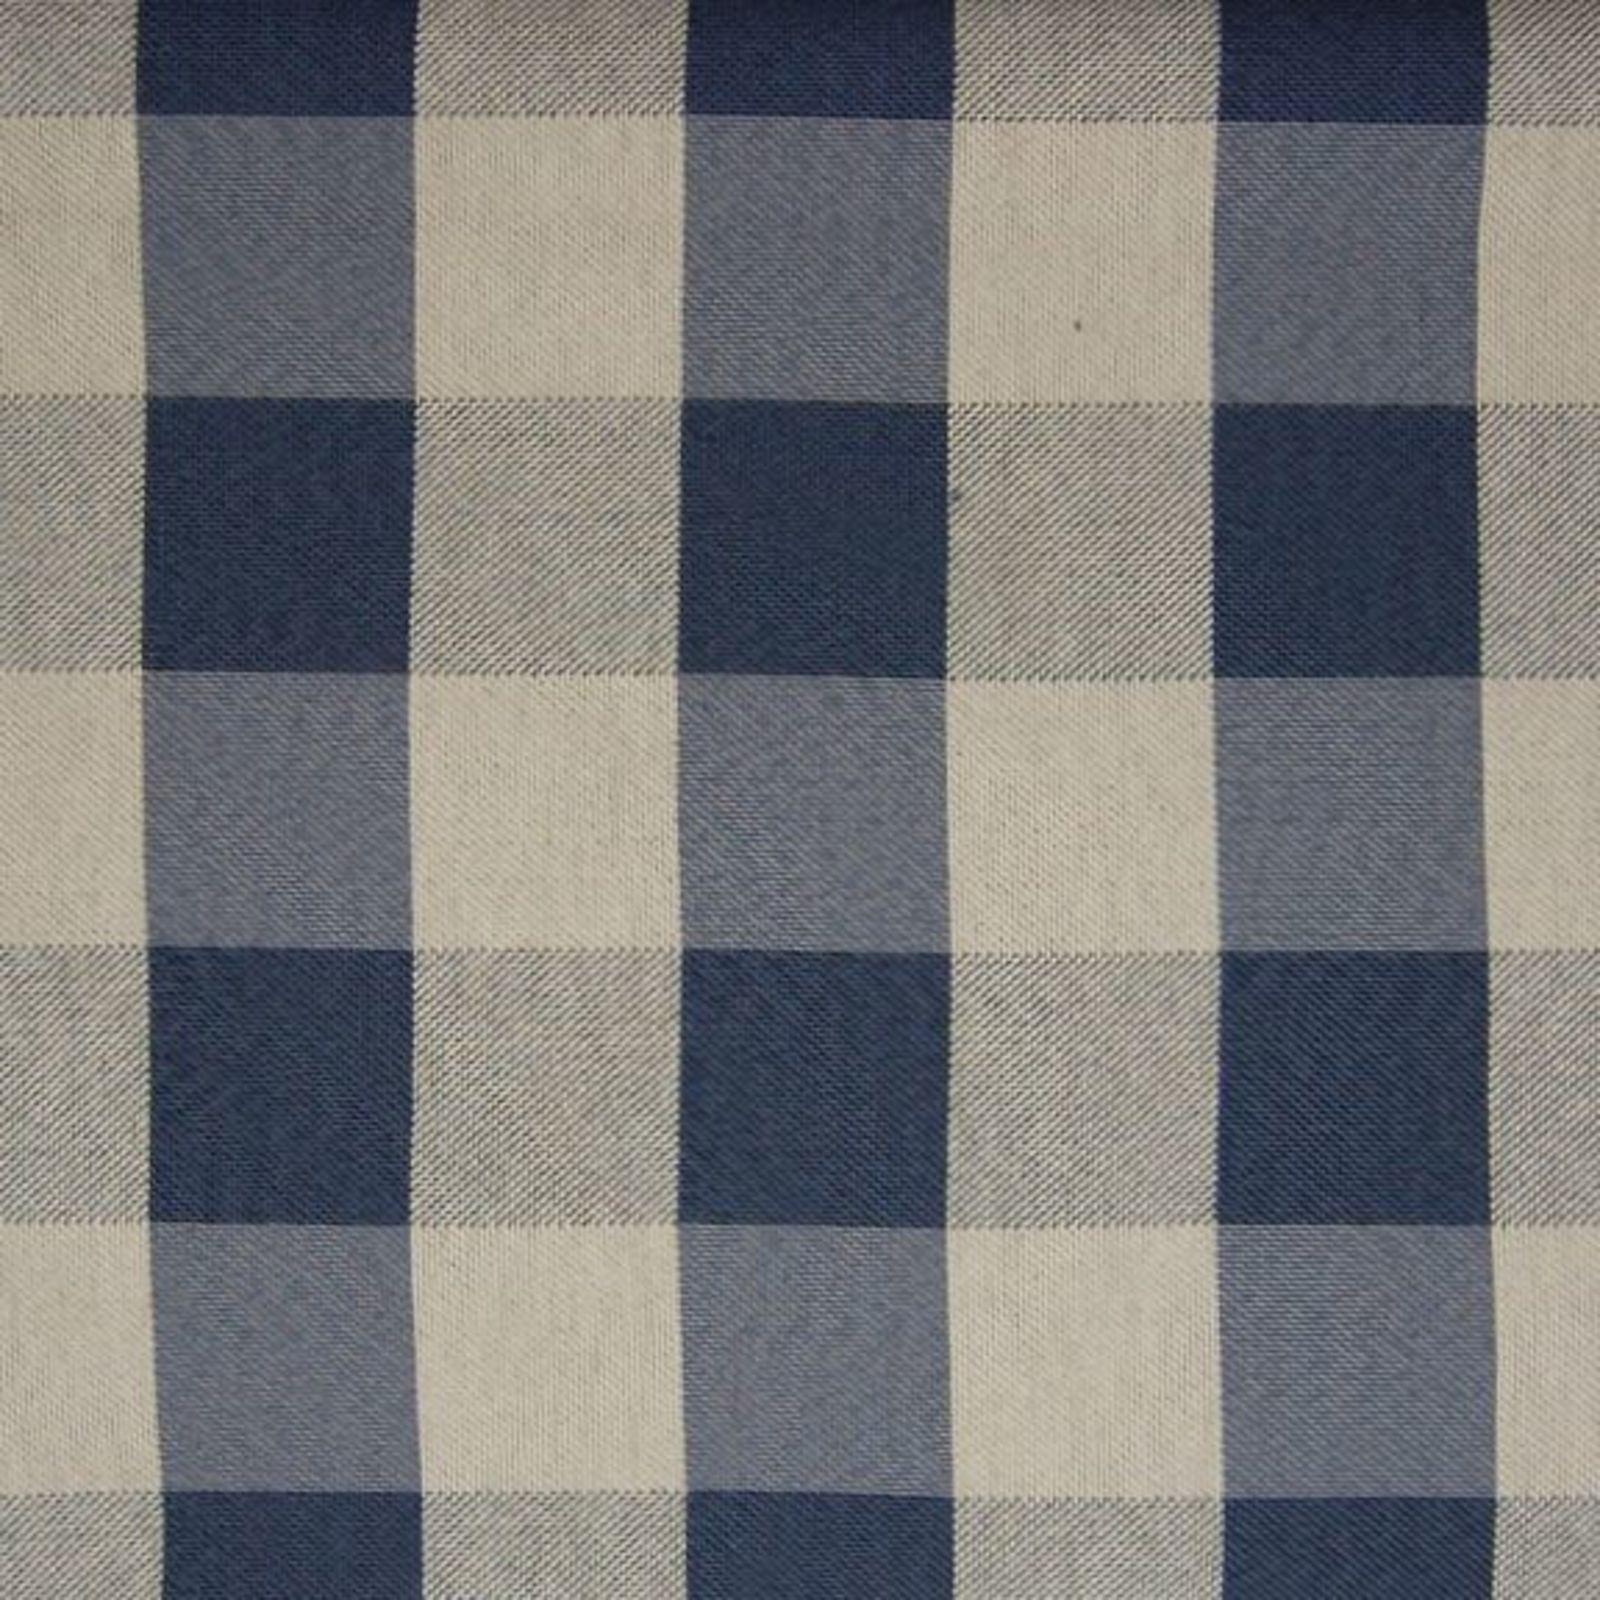 73432 Nautical Greenhouse fabrics, Buffalo plaid fabric